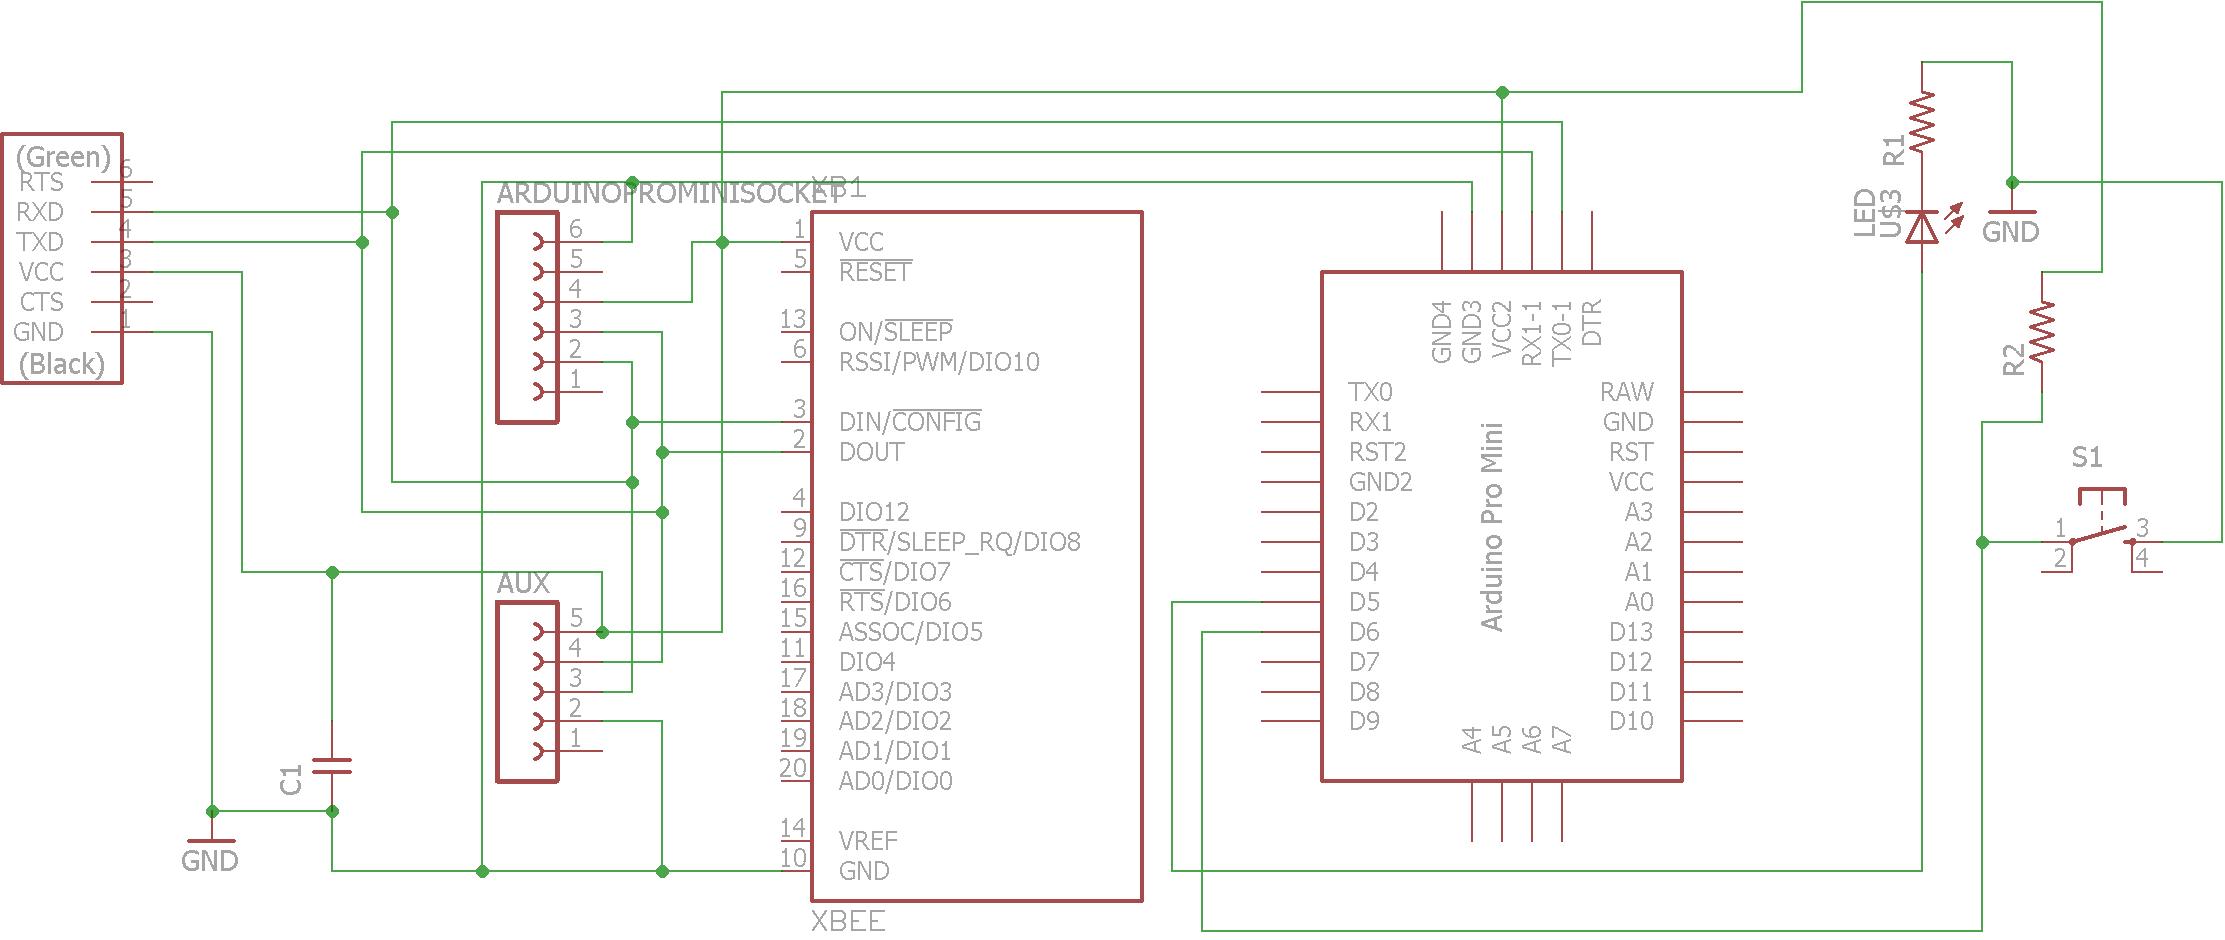 ignment15 Xbee Schematic Diagram on